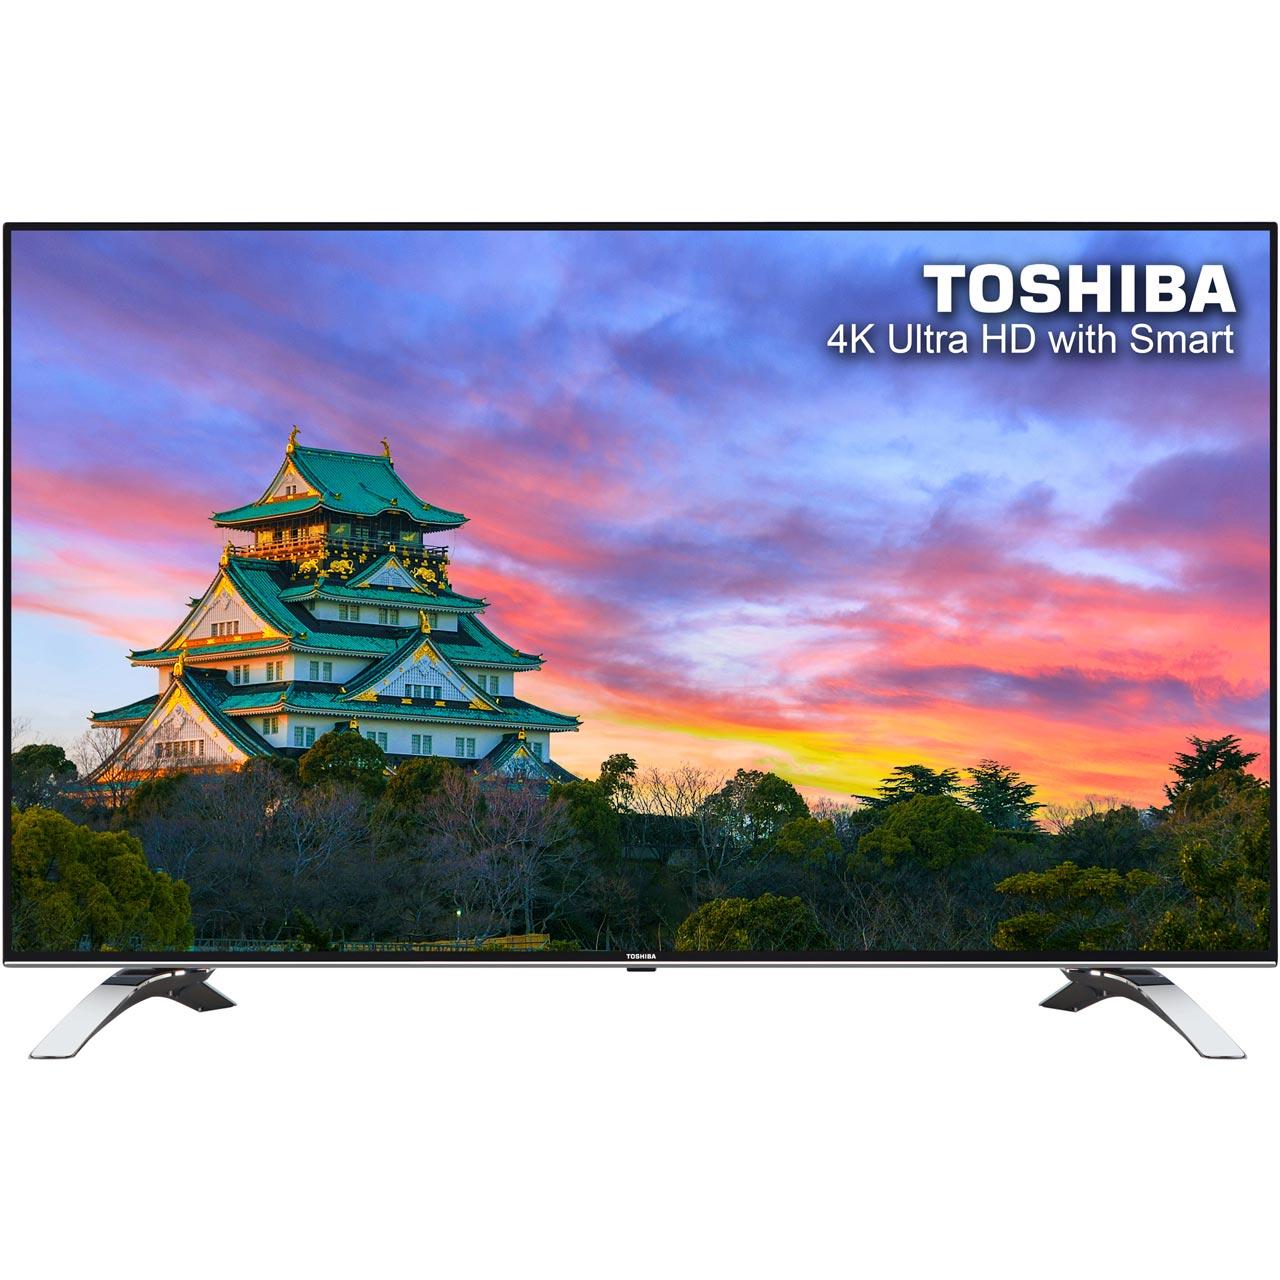 "Toshiba 55U6663DB 55"" Smart 4K Ultra HD TV - Black  with code £359 at AO"